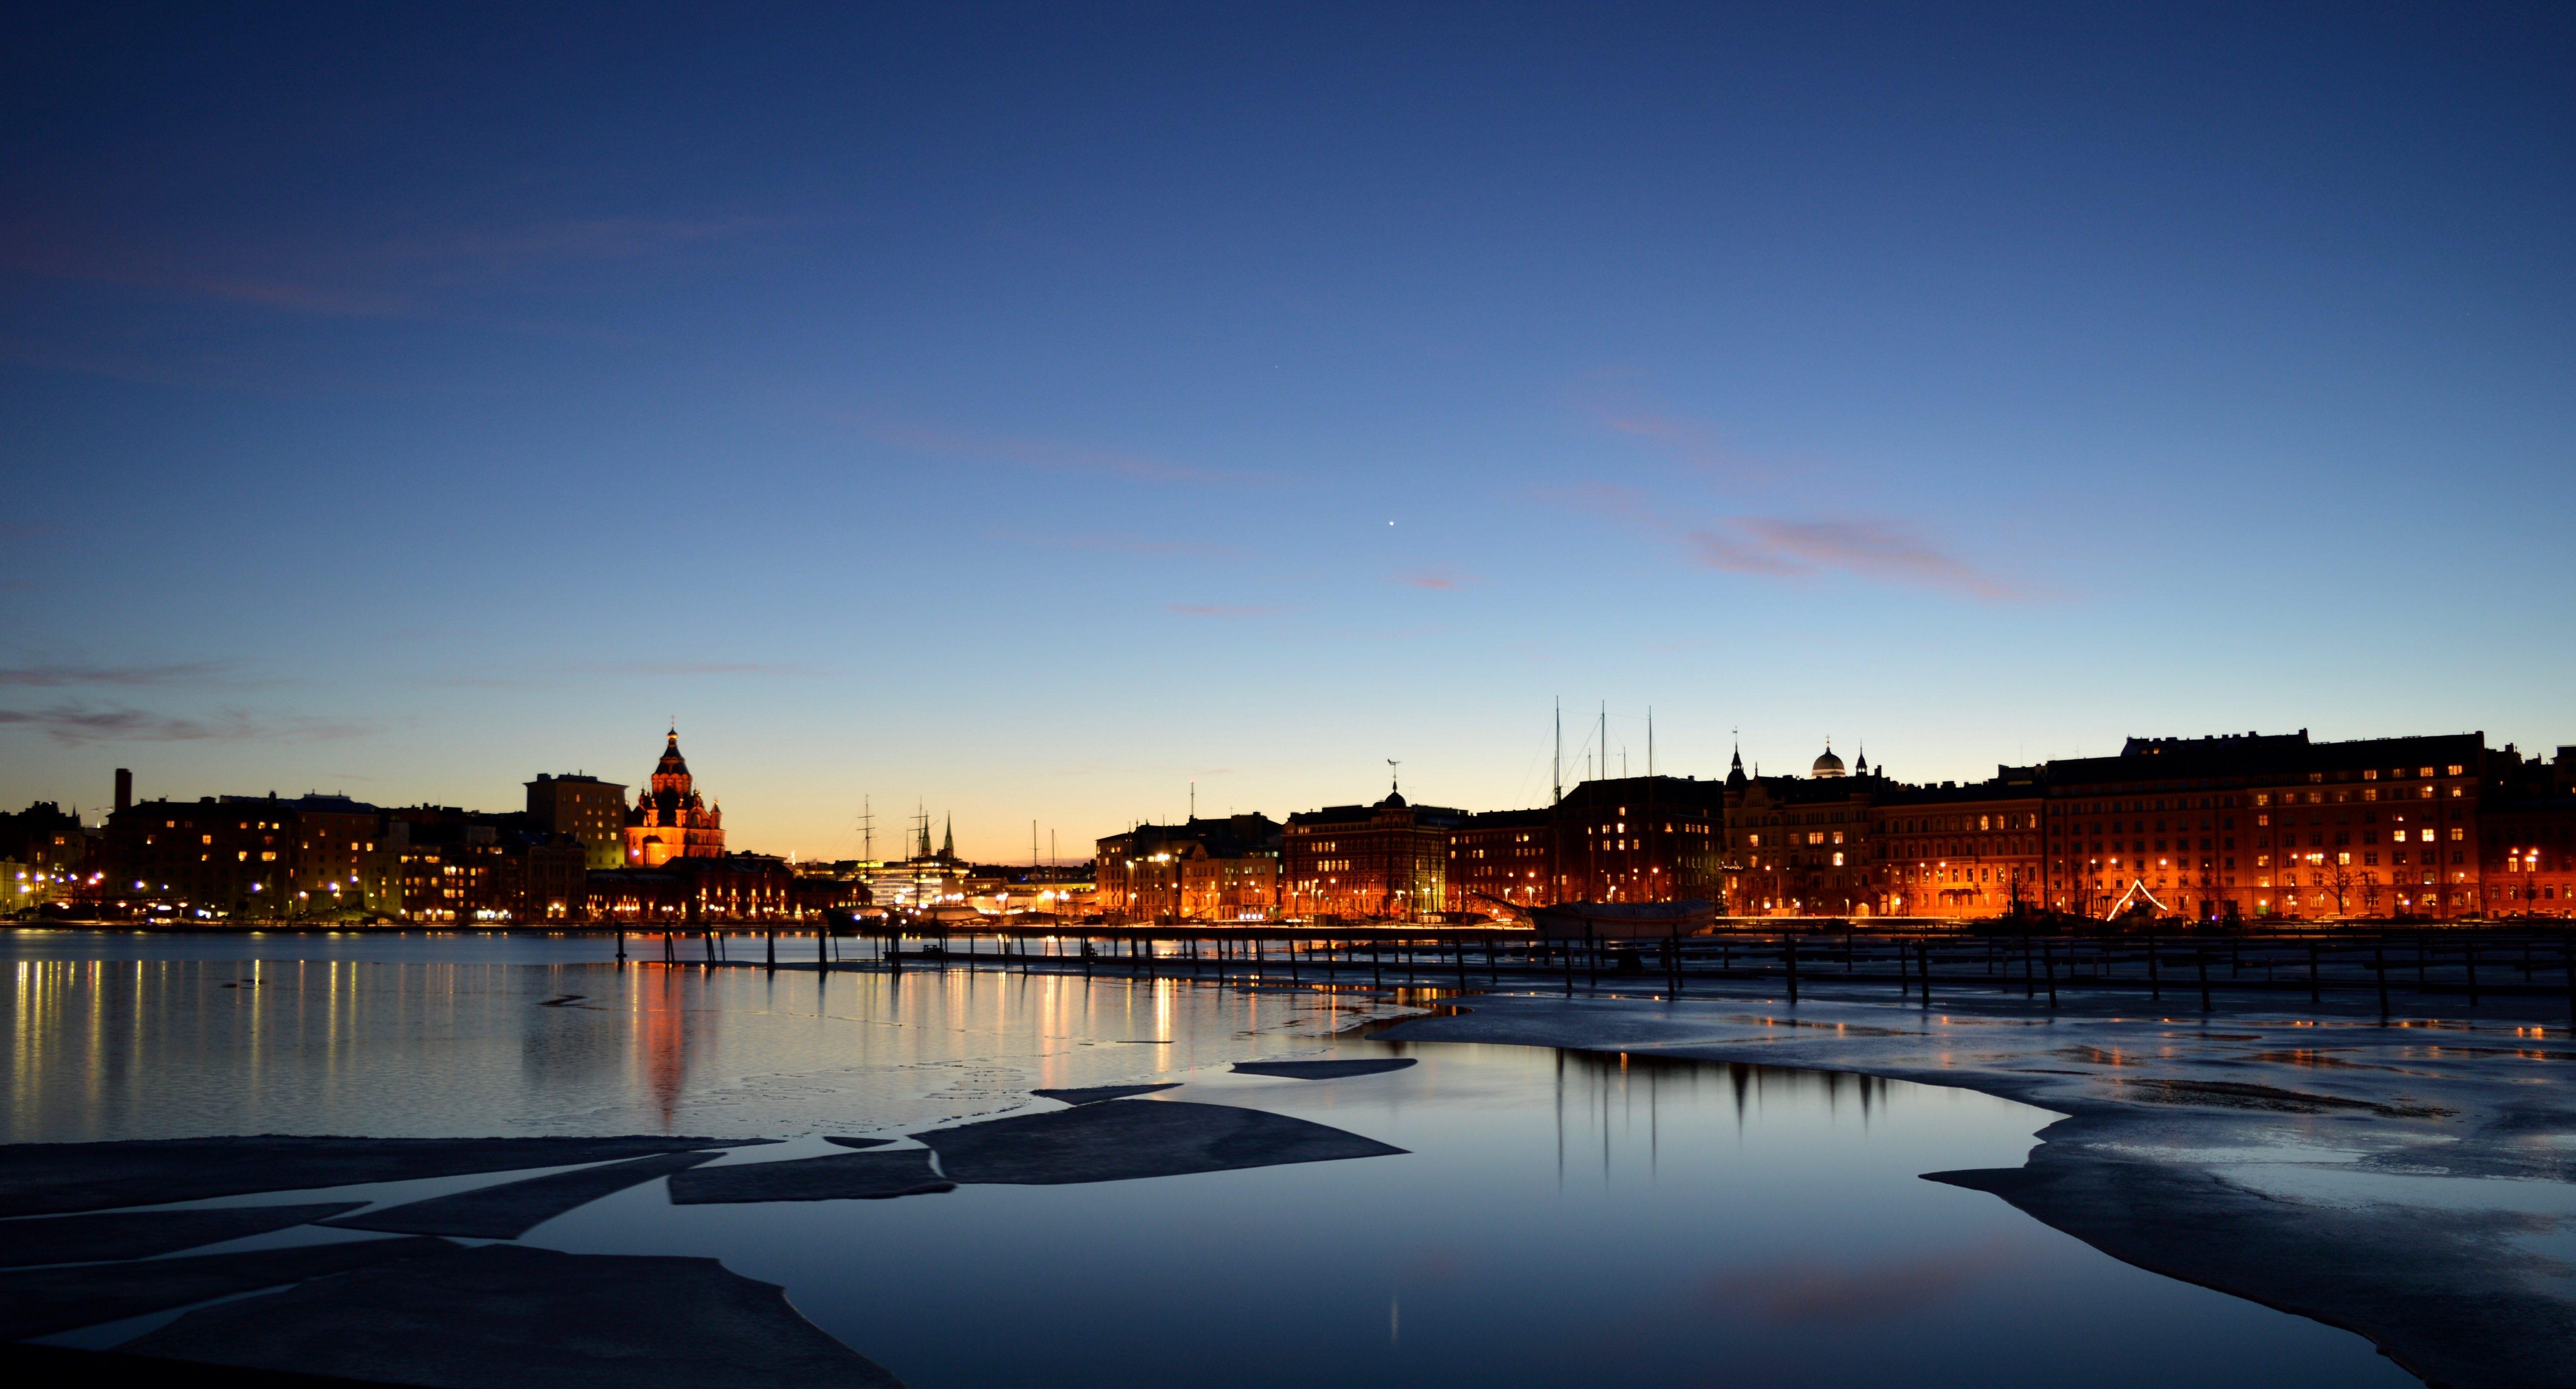 Fähre Stockholm-Helsinki Helsinki in der Nacht